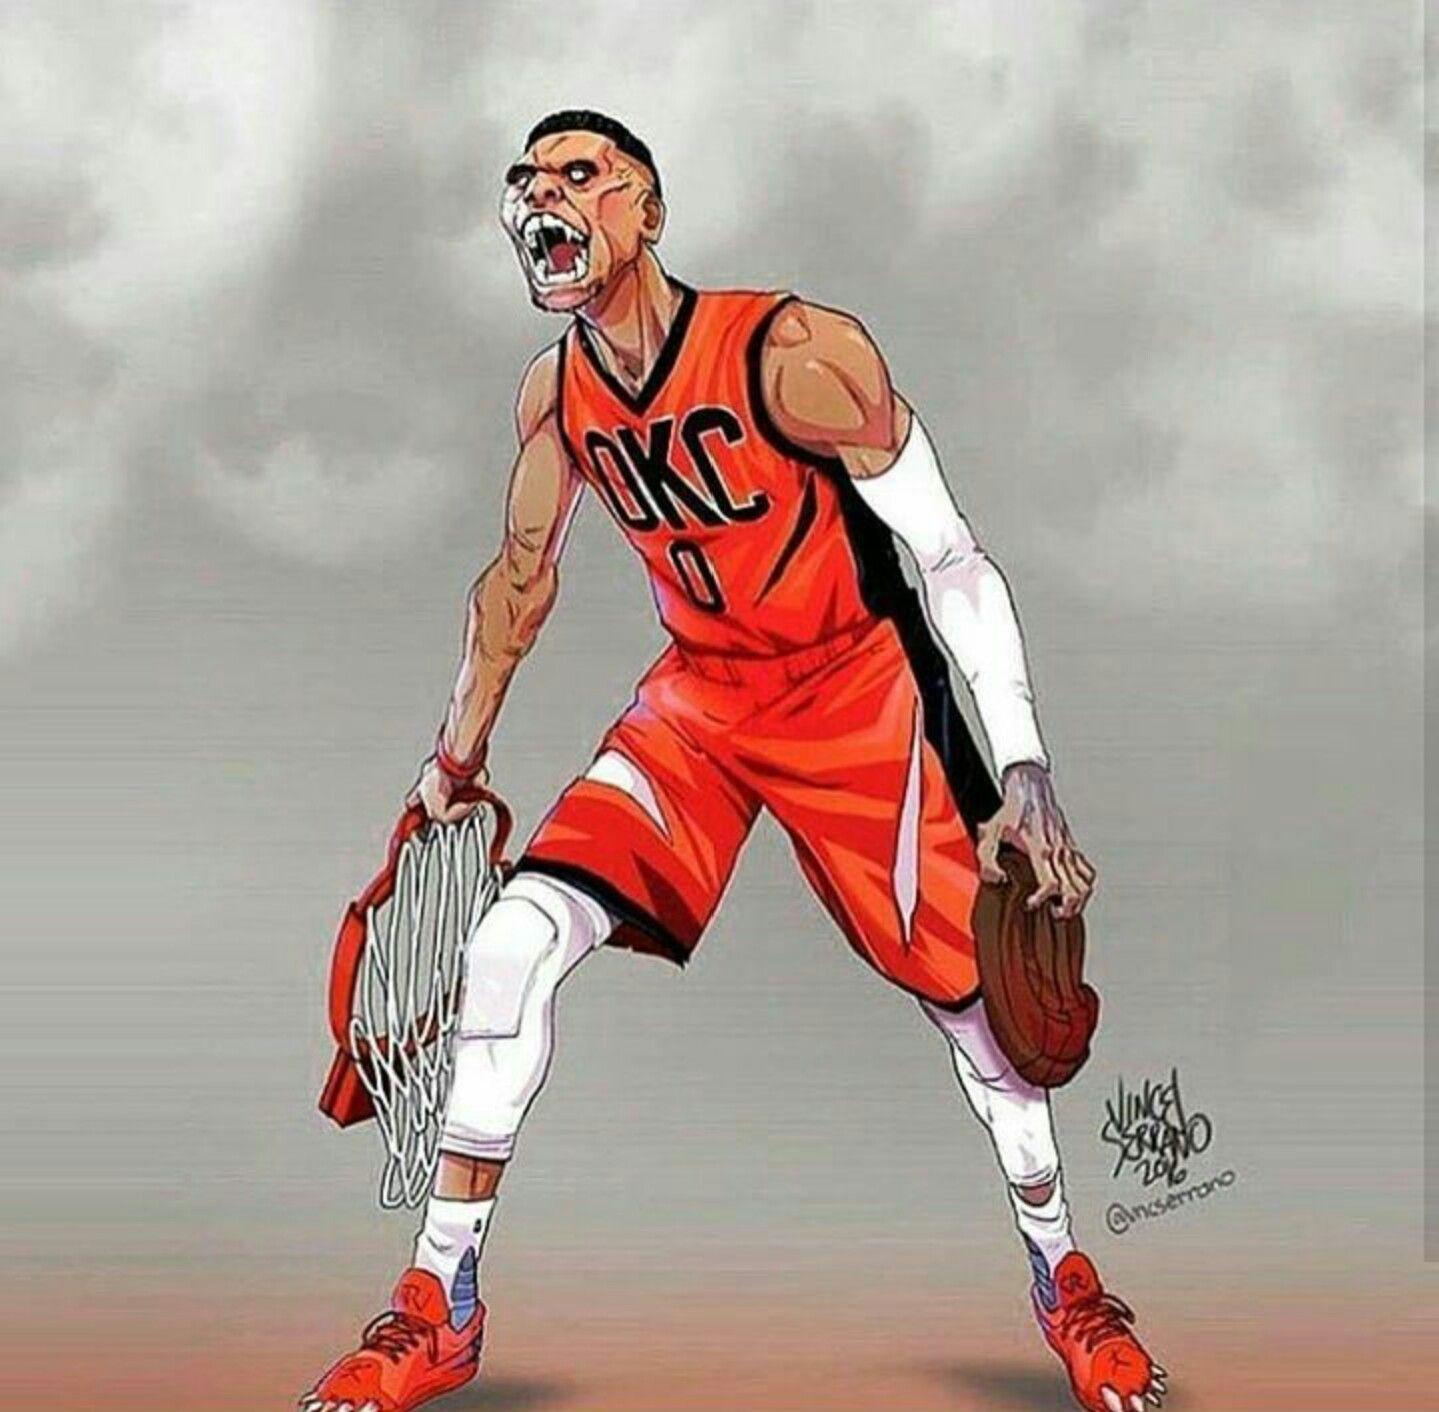 Pin by chaz davis on sports | Pinterest | NBA, Basketball and Basketball art